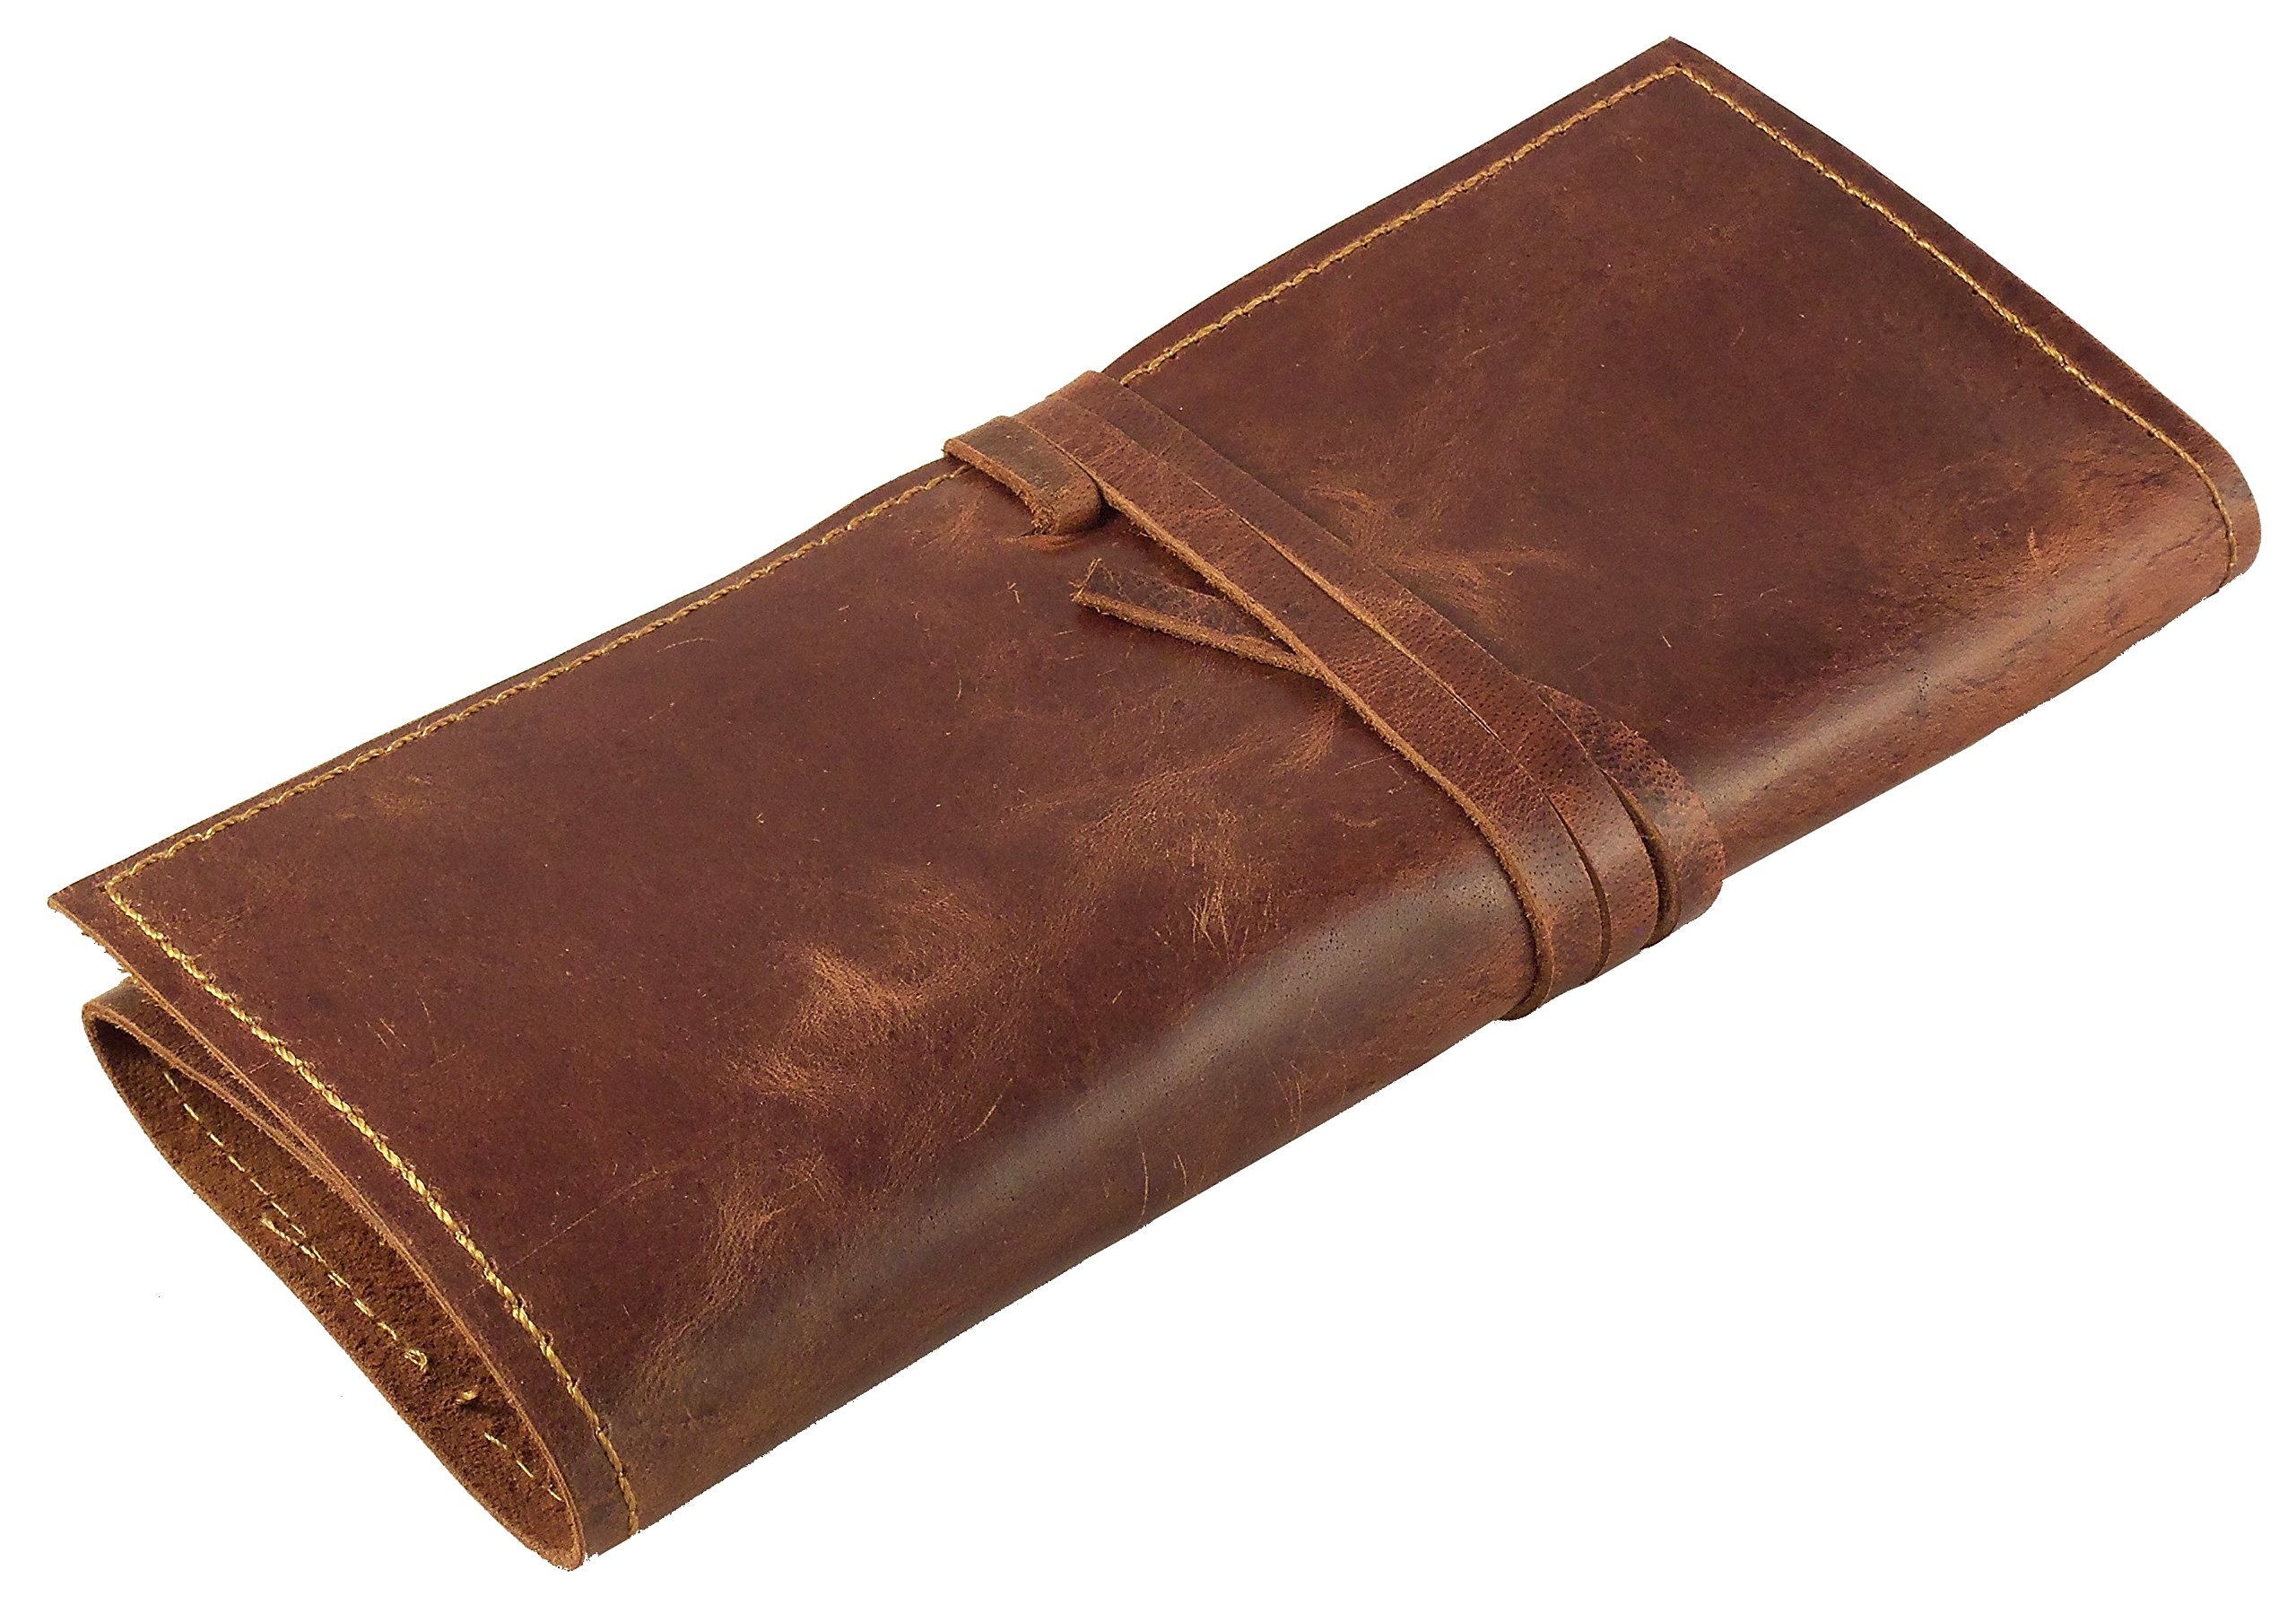 Rustic Genuine Leather Pencil Roll - Pen and Pencil Case - Dark Brown